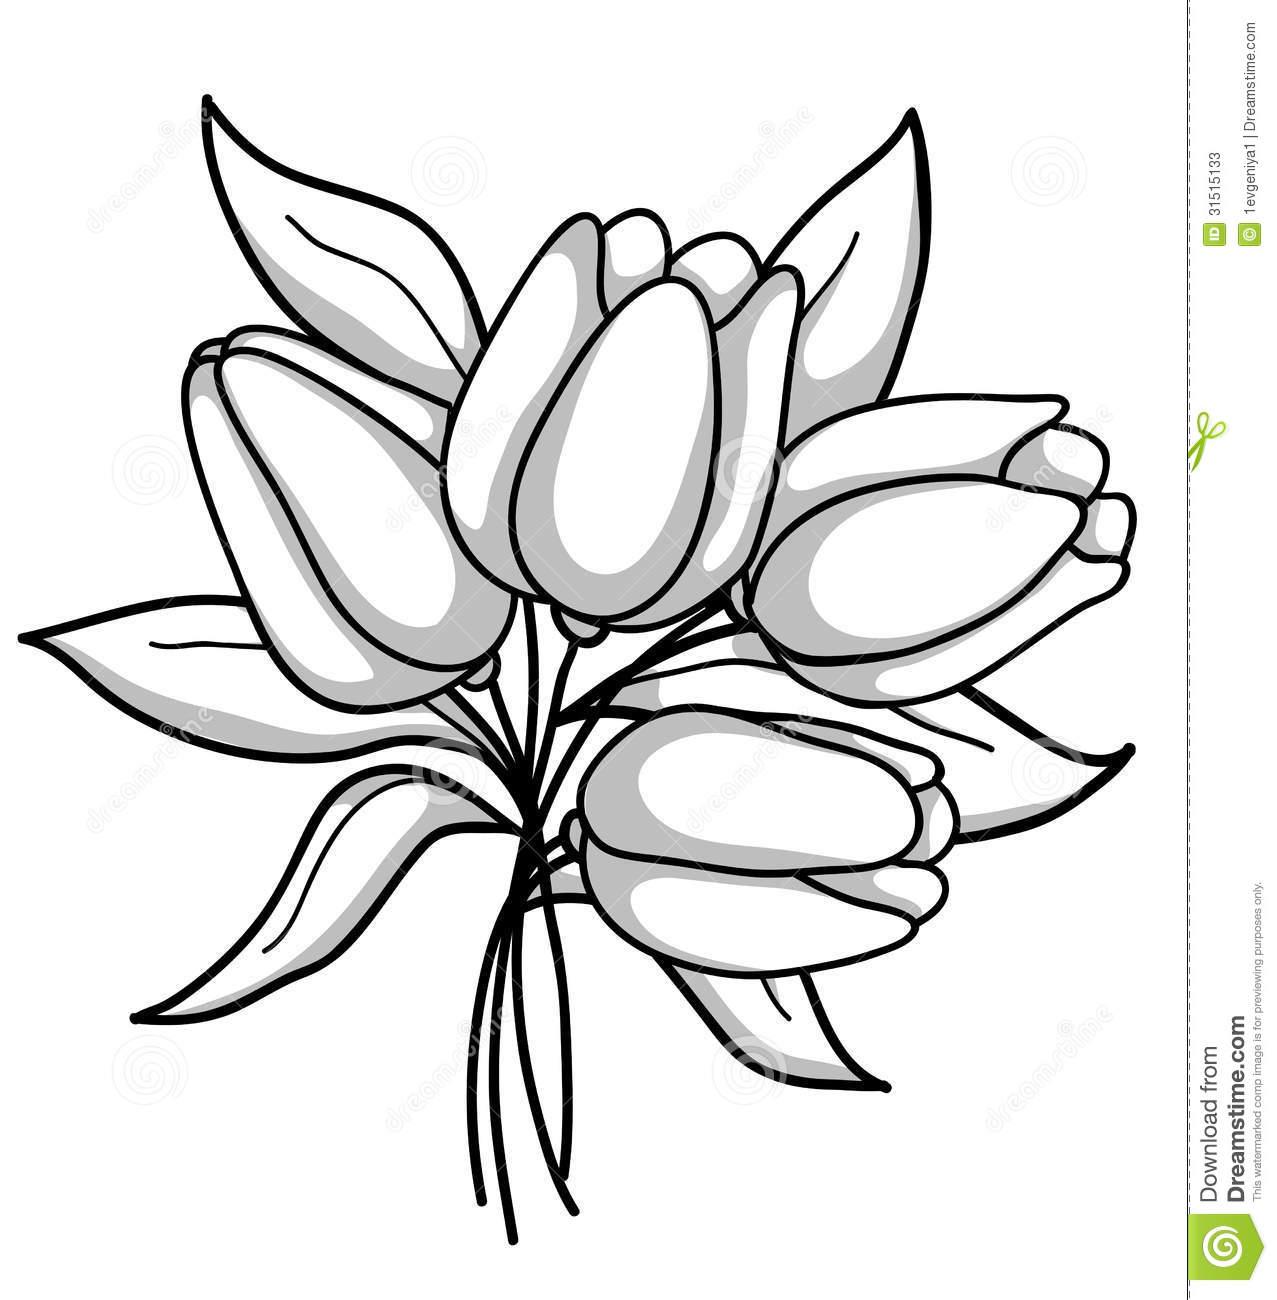 1277x1300 Flower Bouquet Clip Art Black And White